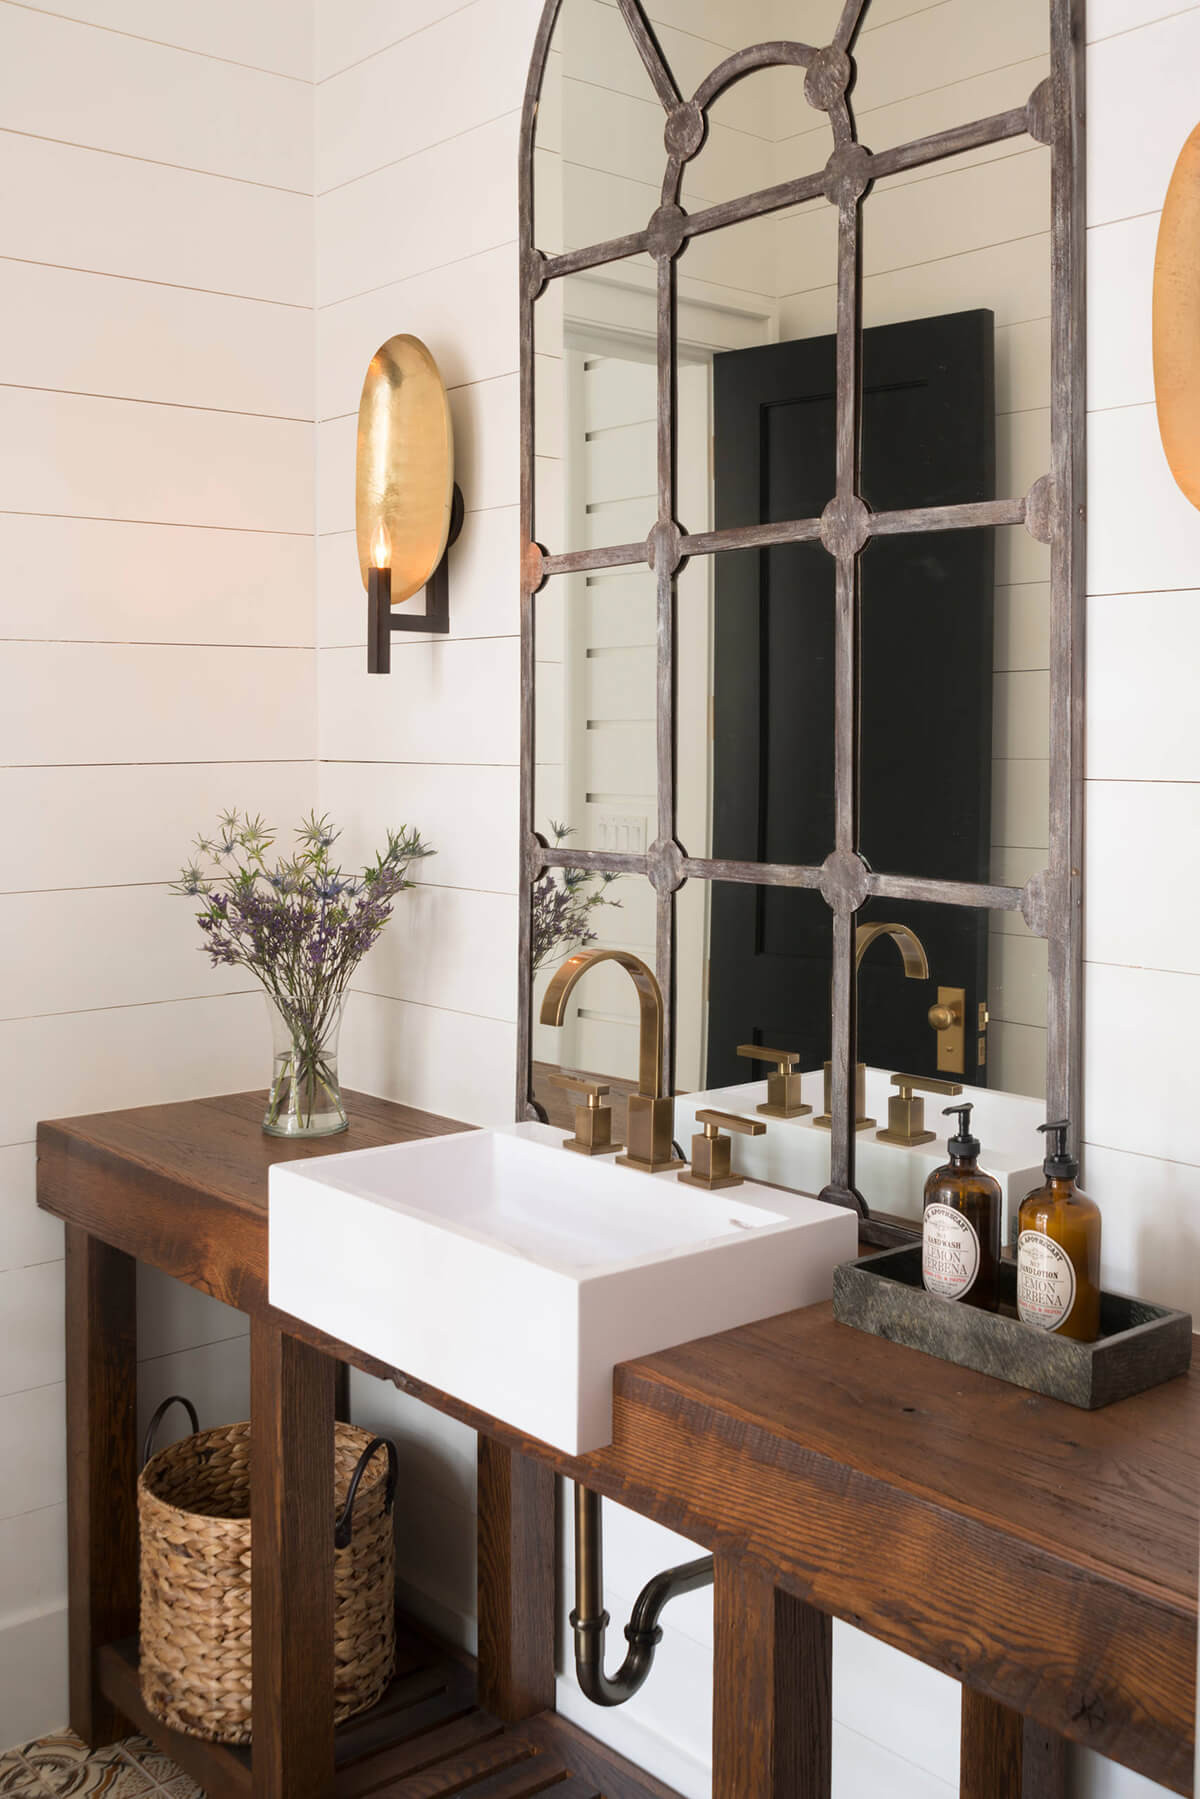 Farmhouse Bathroom Mirrors  25 Best Farmhouse Mirror Ideas and Designs for 2020